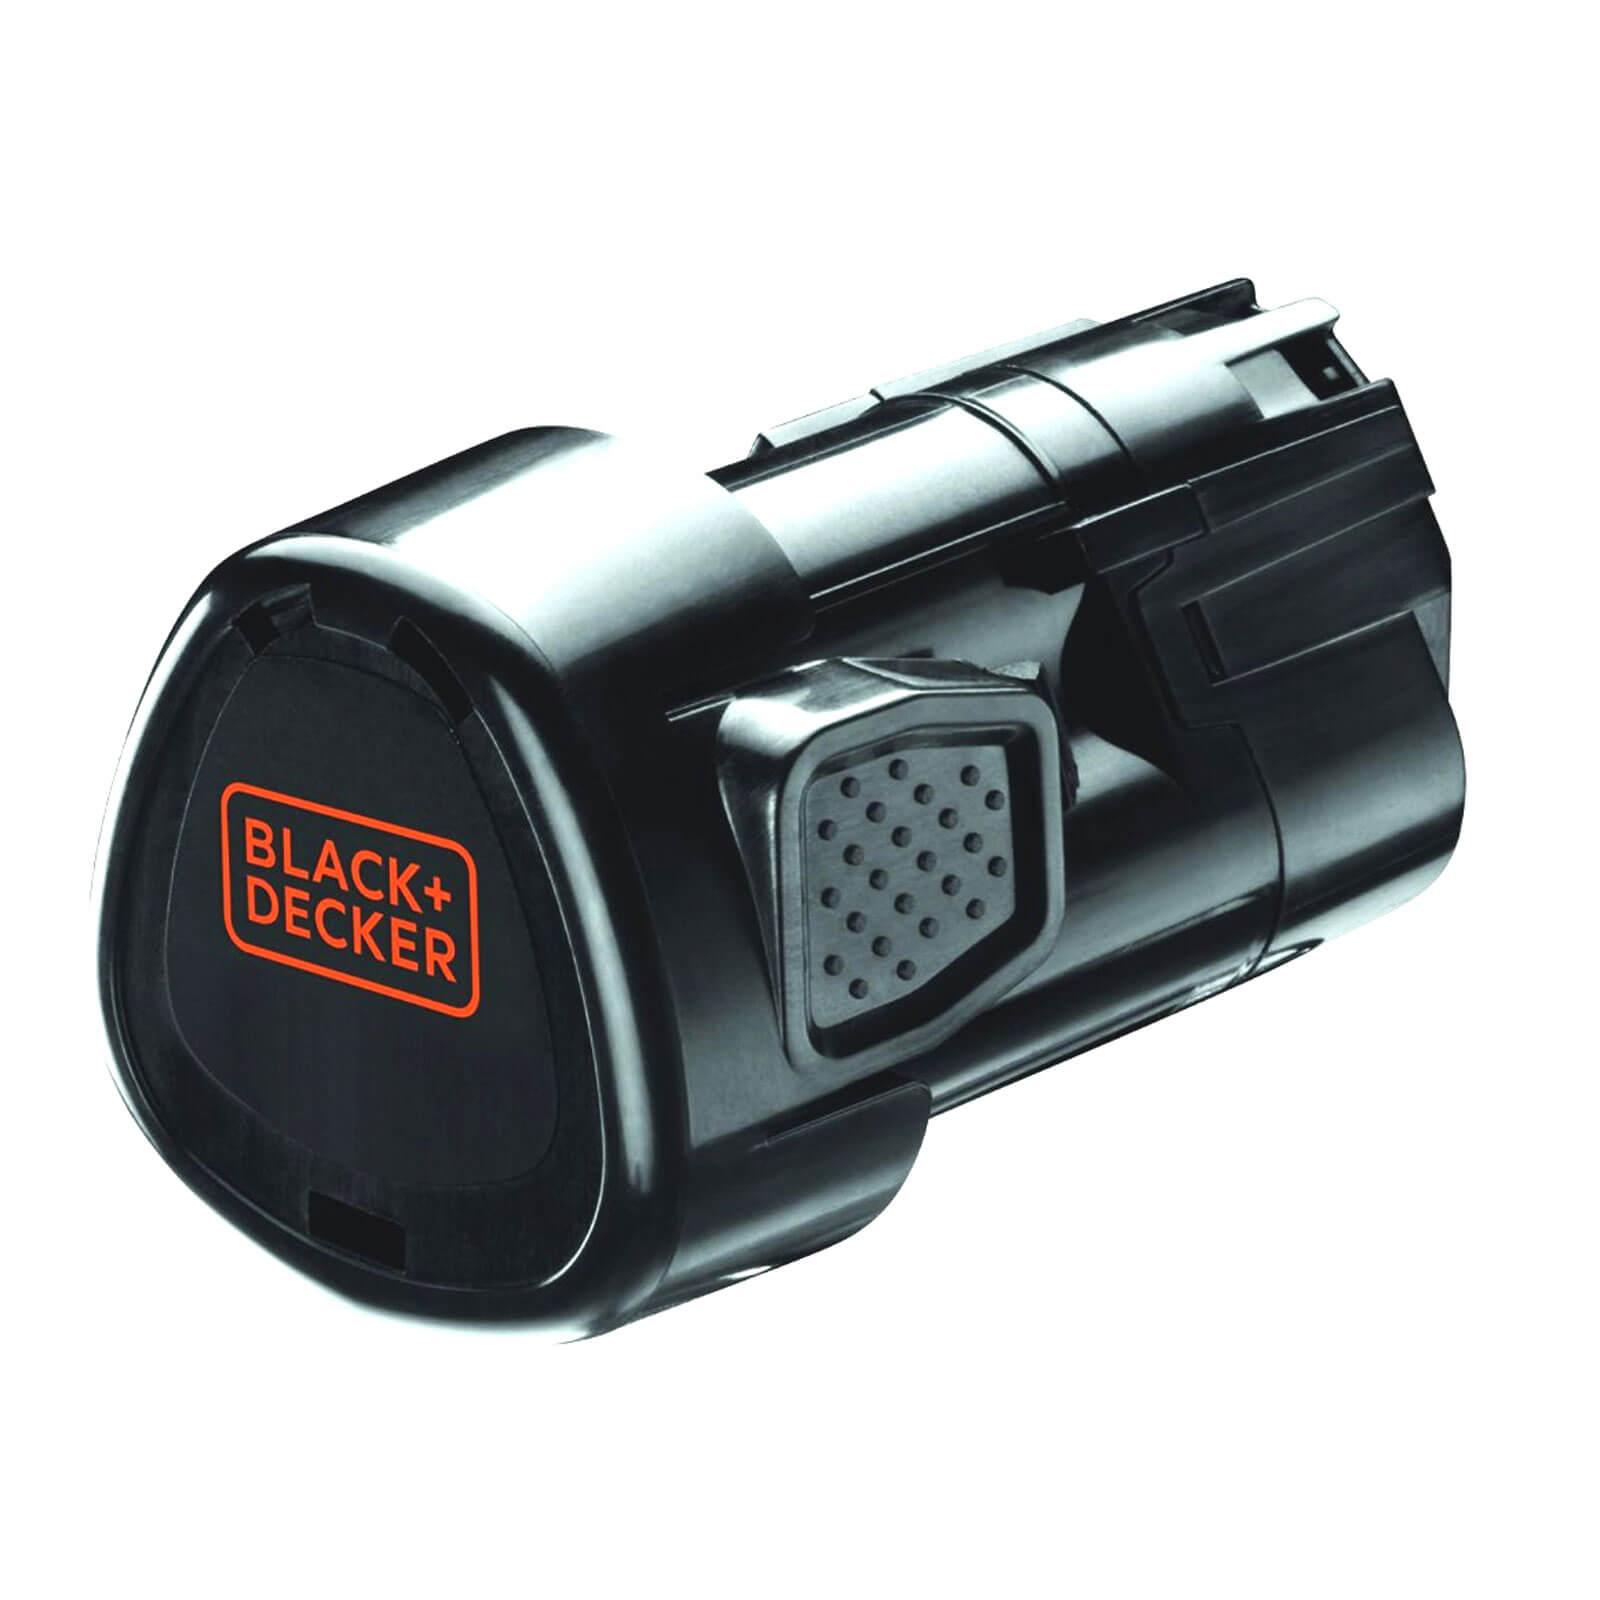 Image of Black & Decker Genuine BL1510 10.8v Cordless Li-ion Battery 1.5ah 1.5ah